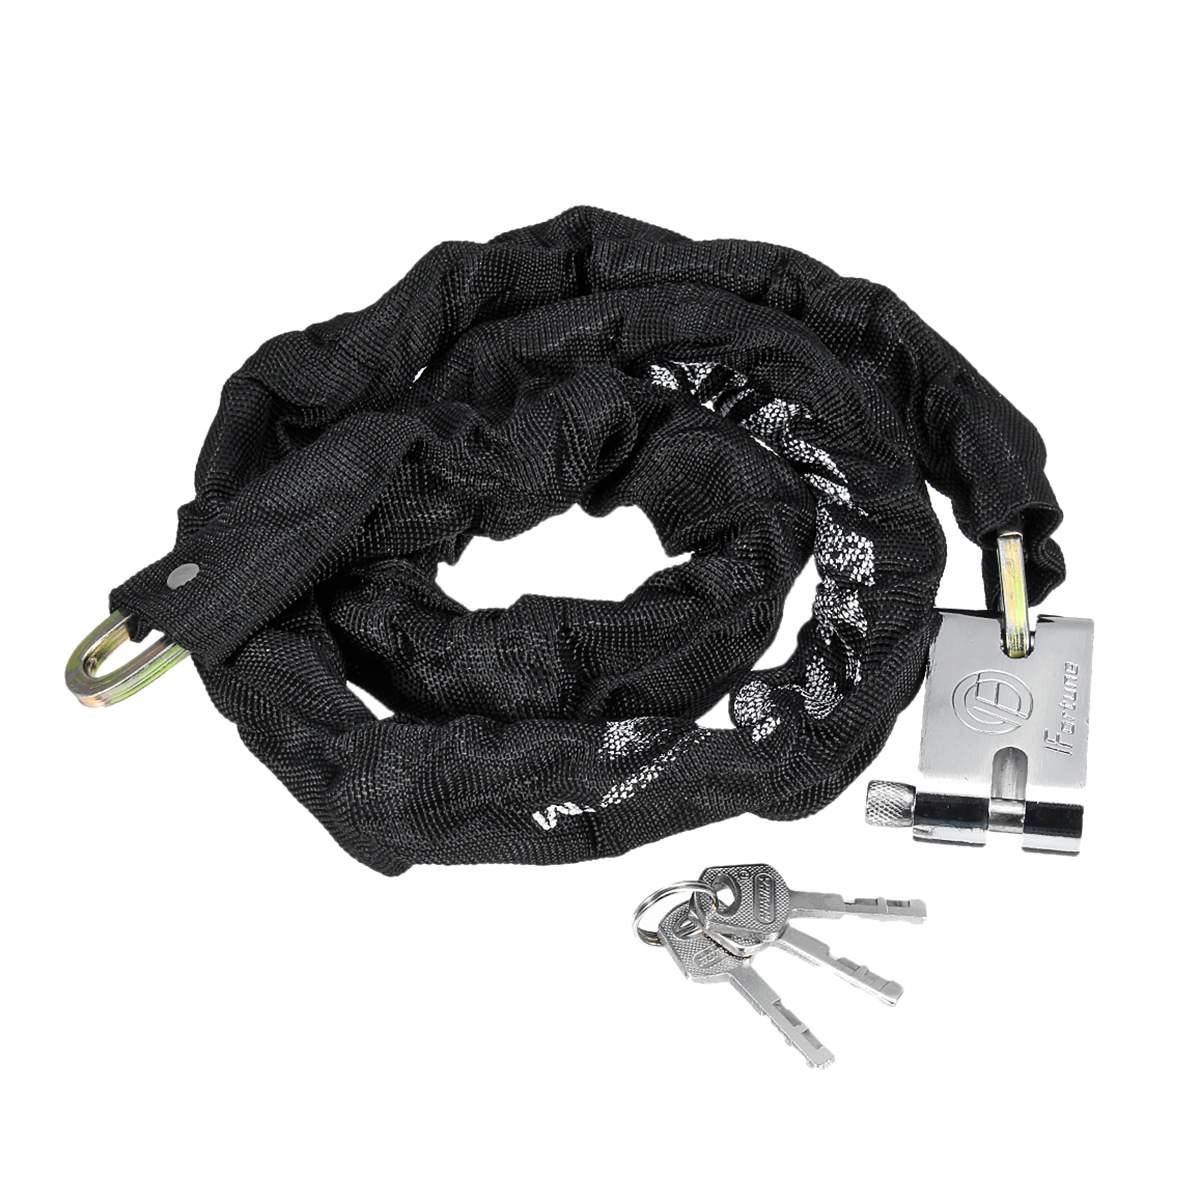 65cm/1.8m Motorcycle Chain Lock Pad Motorbike Bicycle Lock Security Anti-Theft Outdoor Reinforced Locks